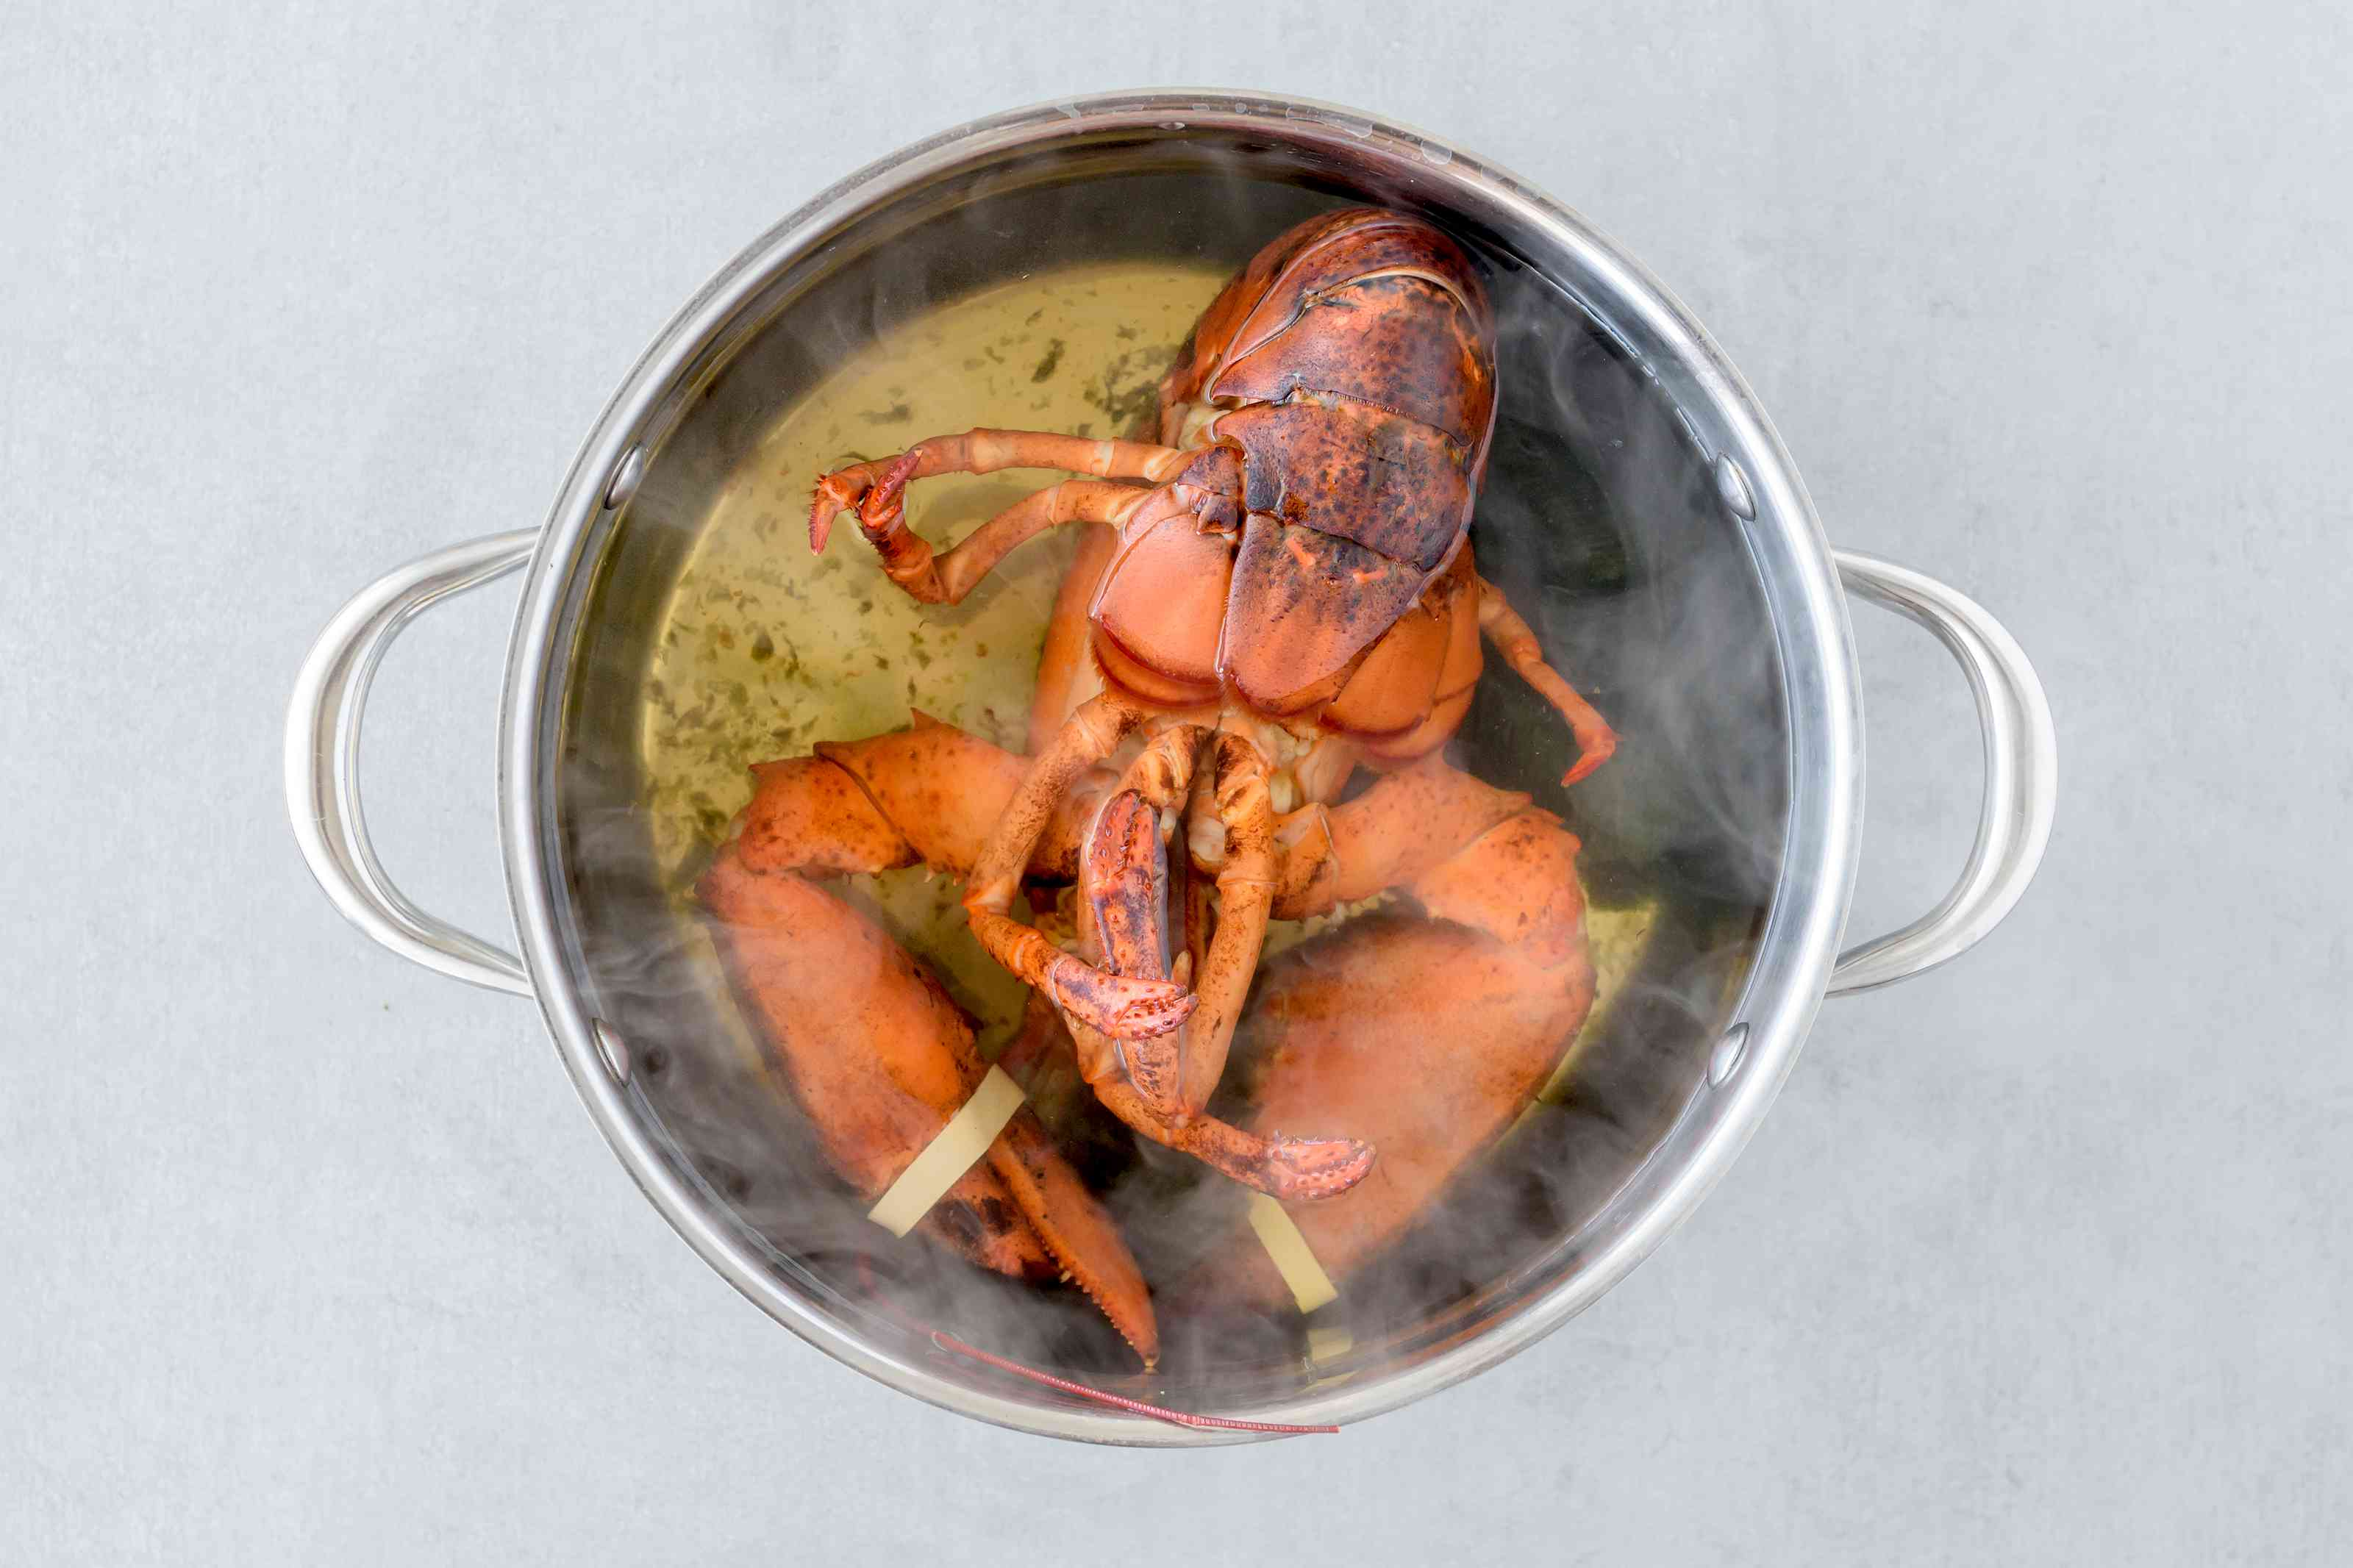 Put lobsters into pot